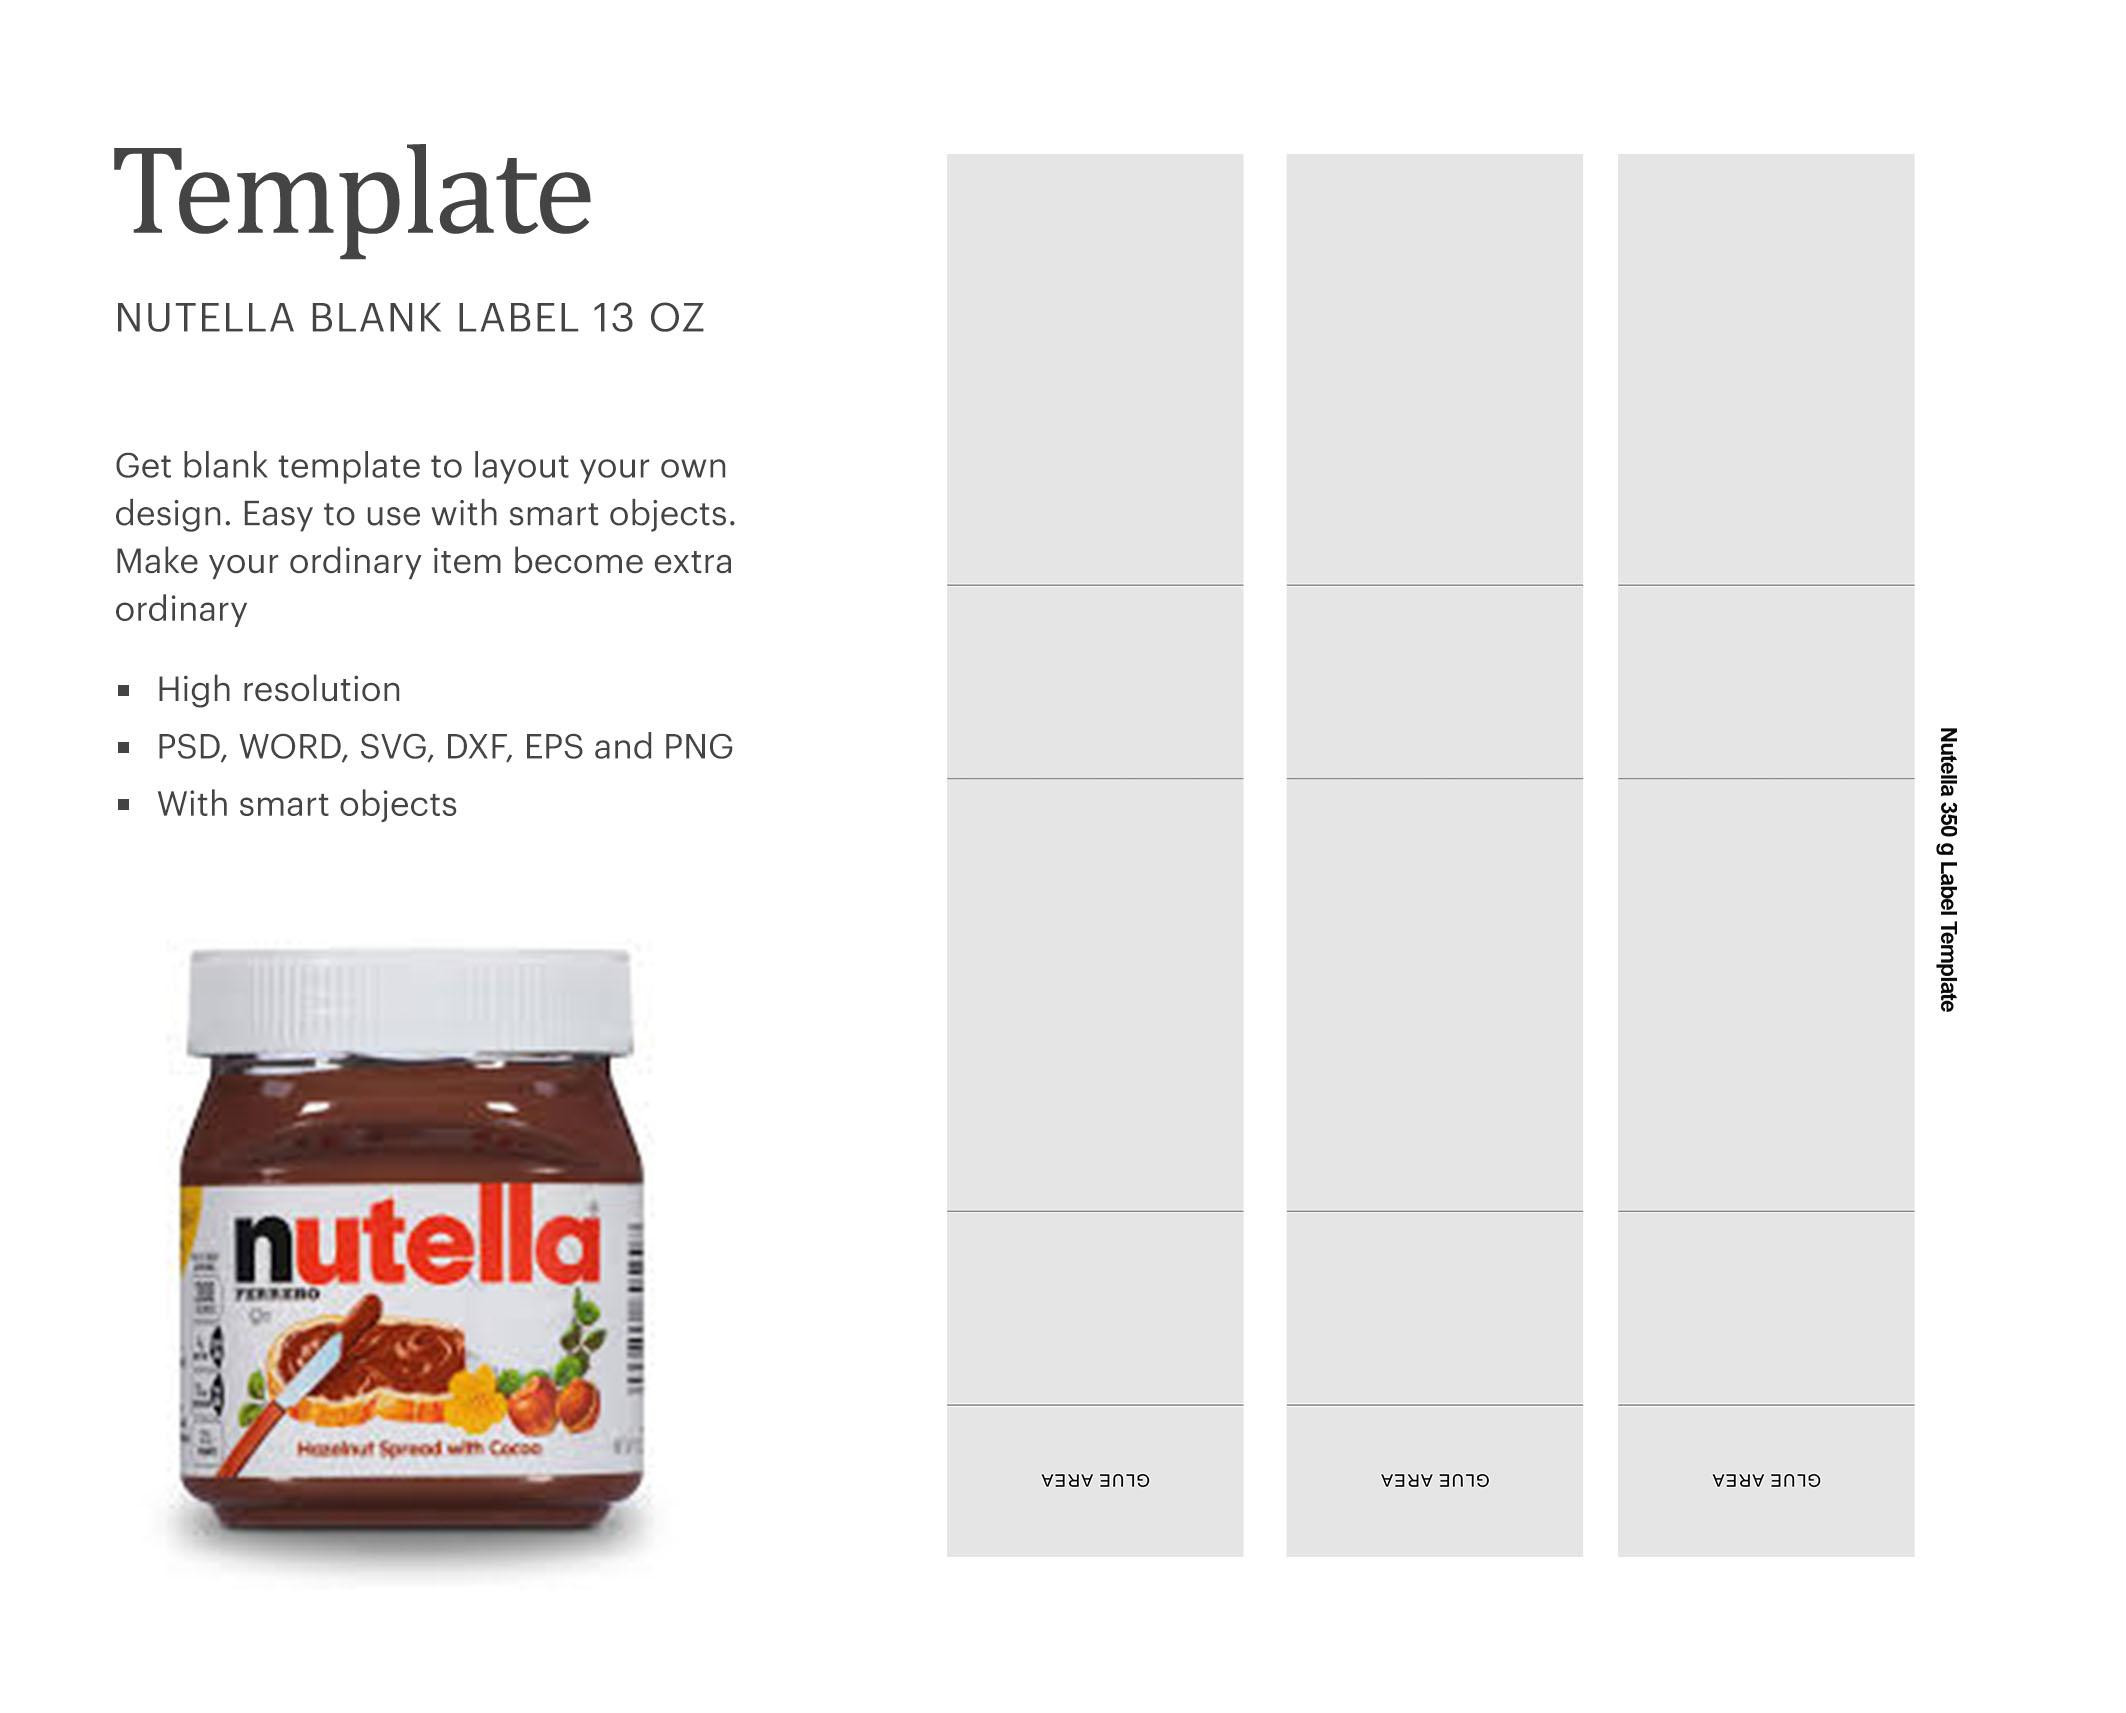 Nutella 13oz Bottle Label Paper Size 8 5 X 11 Crella